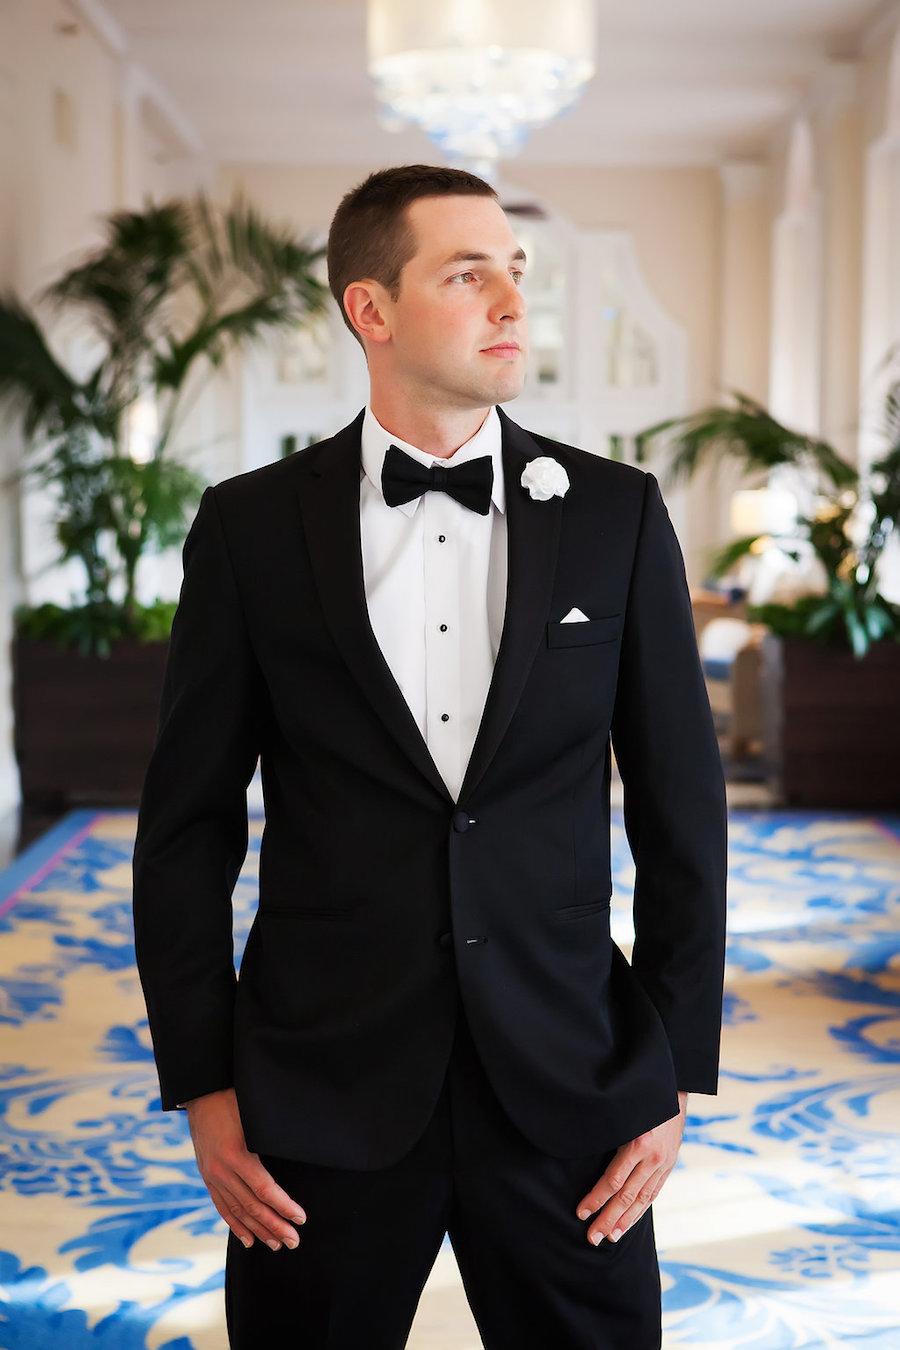 Florida Groom in Tuxedo Wedding Portrait by St. Pete Wedding Photographer Limelight Photography